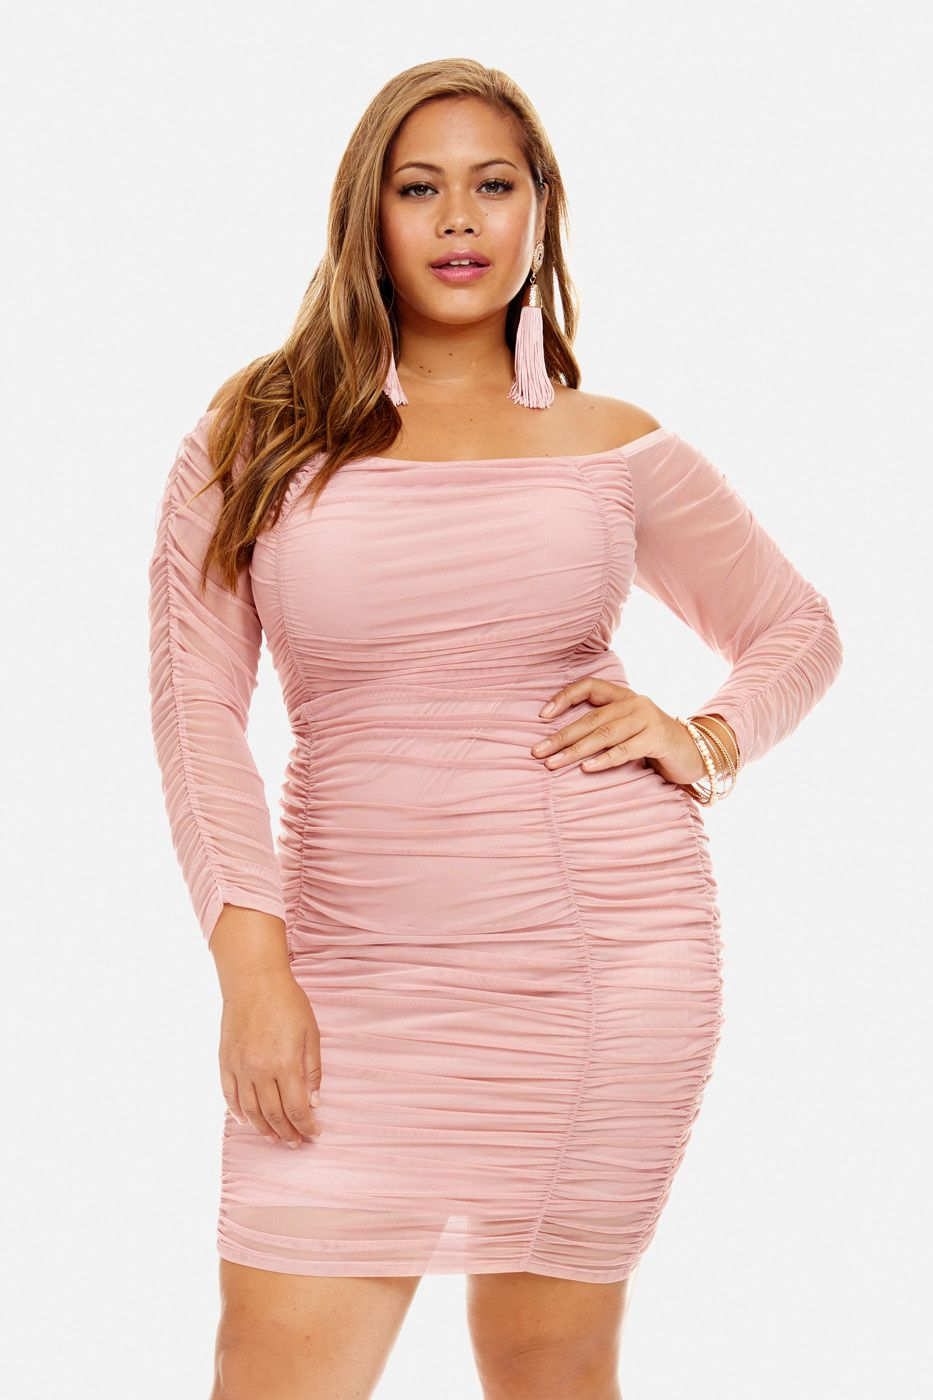 Plus Size Westwood Ruched Mesh Bodycon Dress | Curvas | Pinterest ...